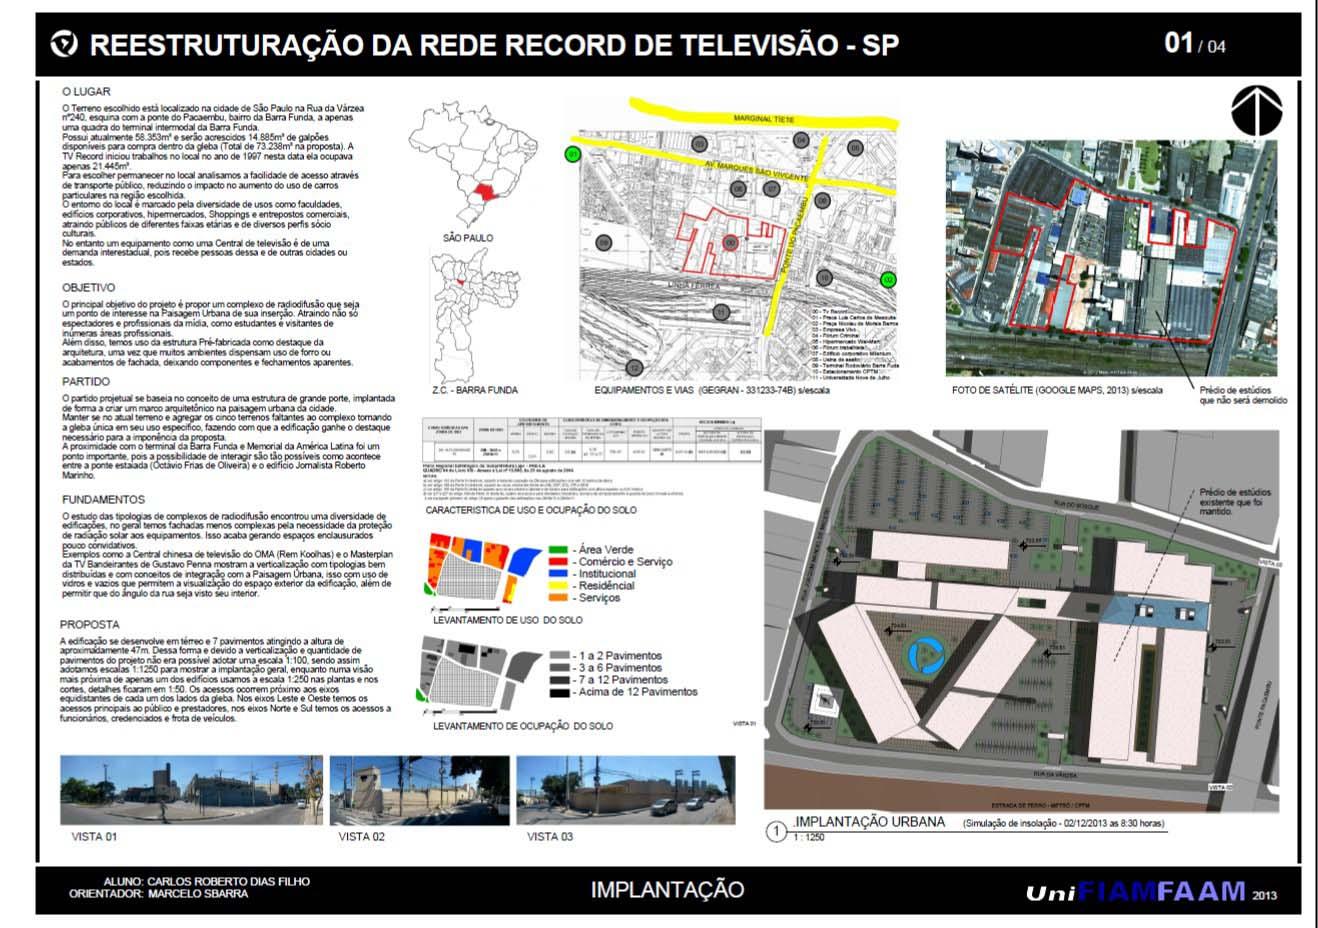 Rede Record - Prancha 01